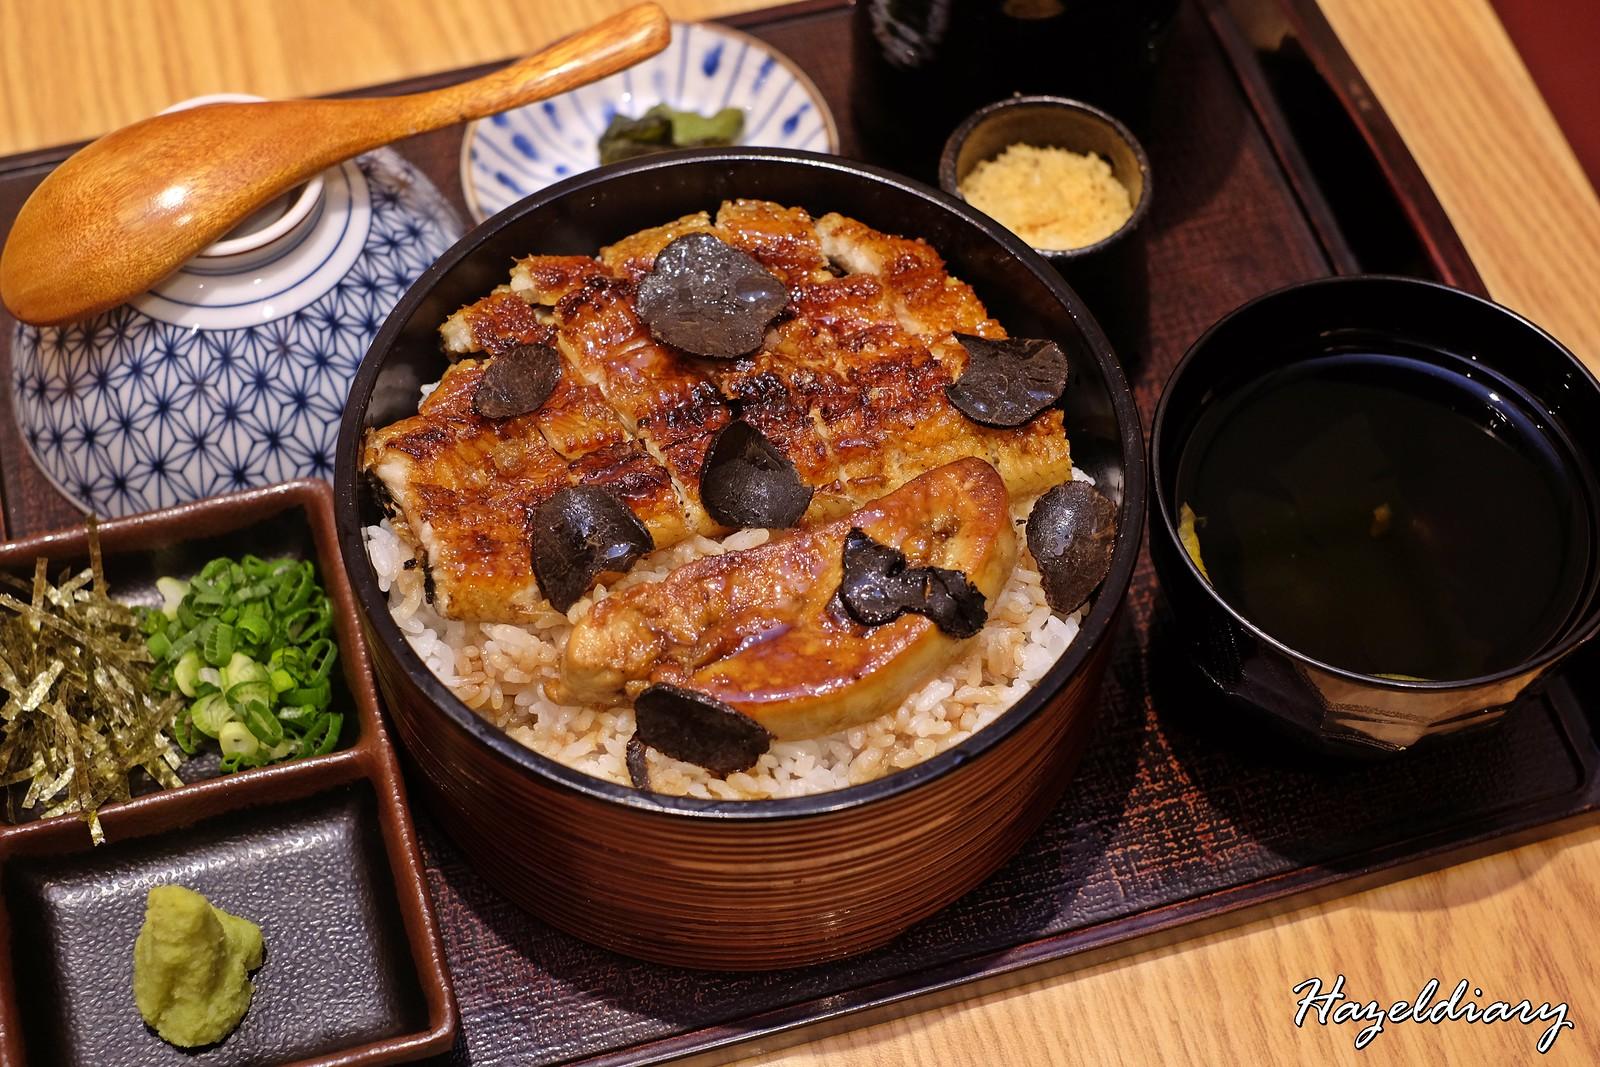 Man Man Unagi Clark Quay-Buttery Charred Foie Gras Hitsumabushi with Black Truffle Flakes